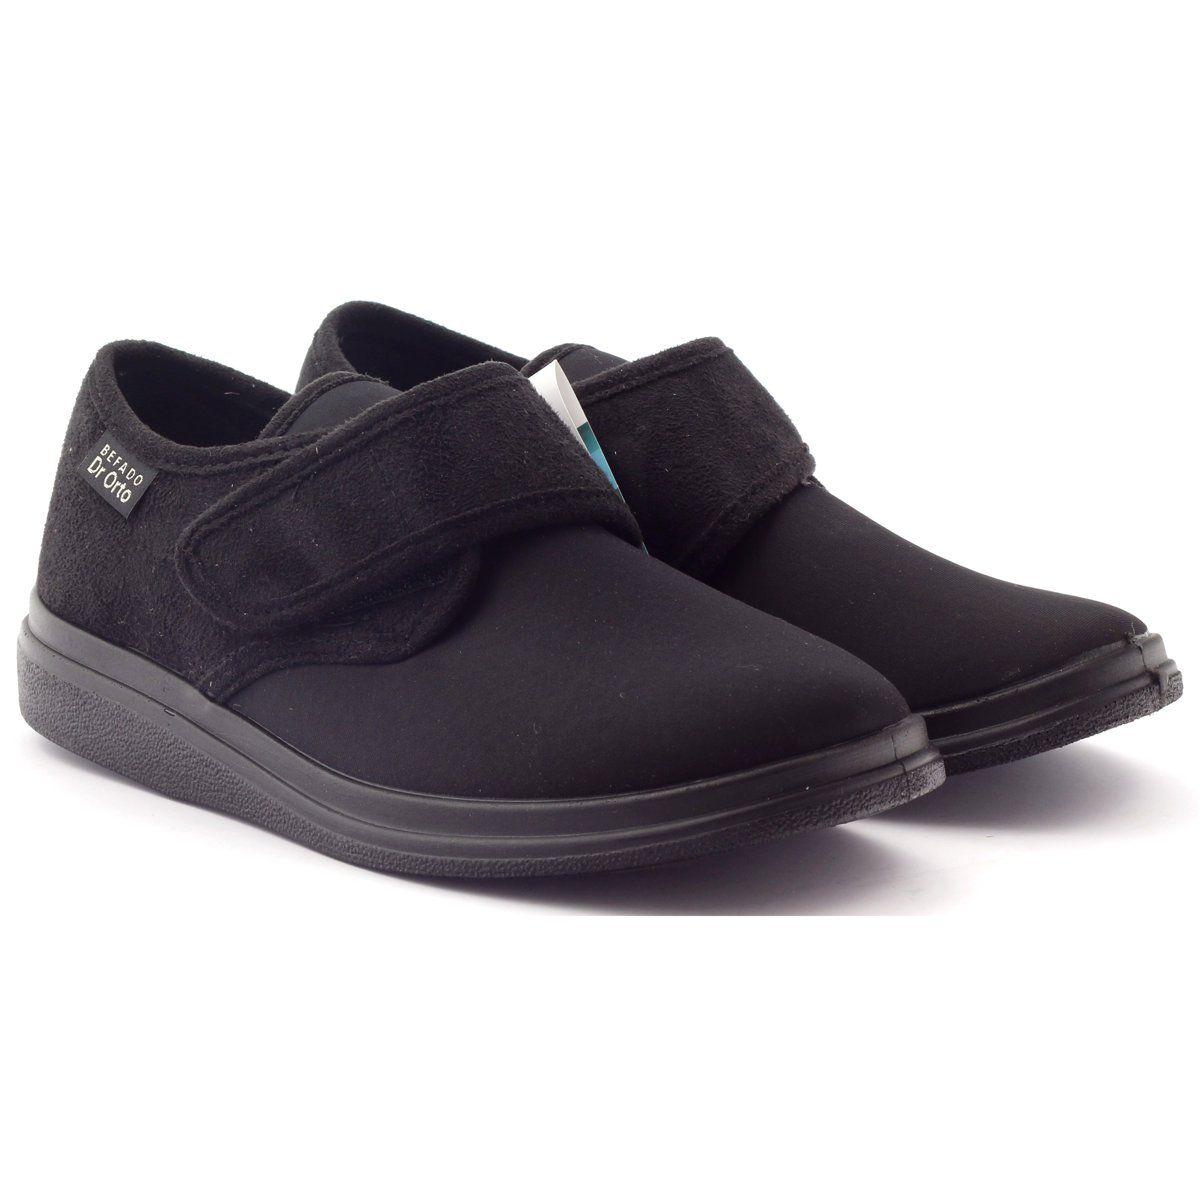 Befado Kapcie Mokasyny Dr Orto Zdrowotne 036d006 Czarne Shoes Slip On Sneaker Sneakers